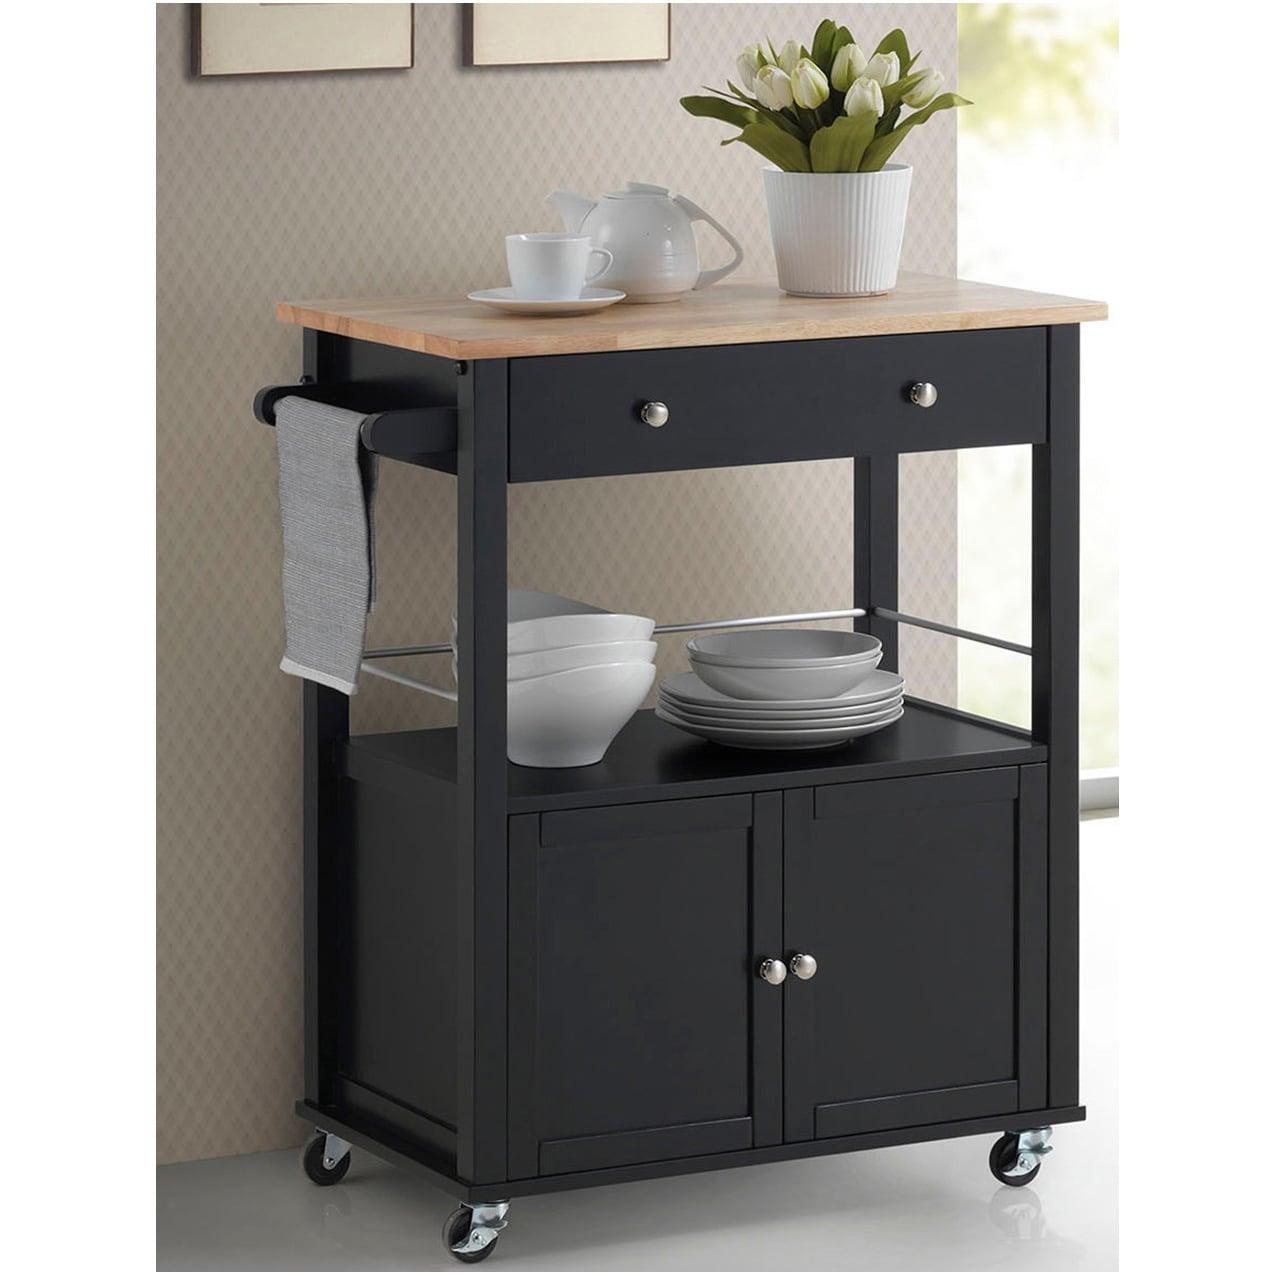 Shop Simple Living Rolling Galvin Microwave Cart: Shop Baxton Studio Denton Contemporary Black Kitchen Cart